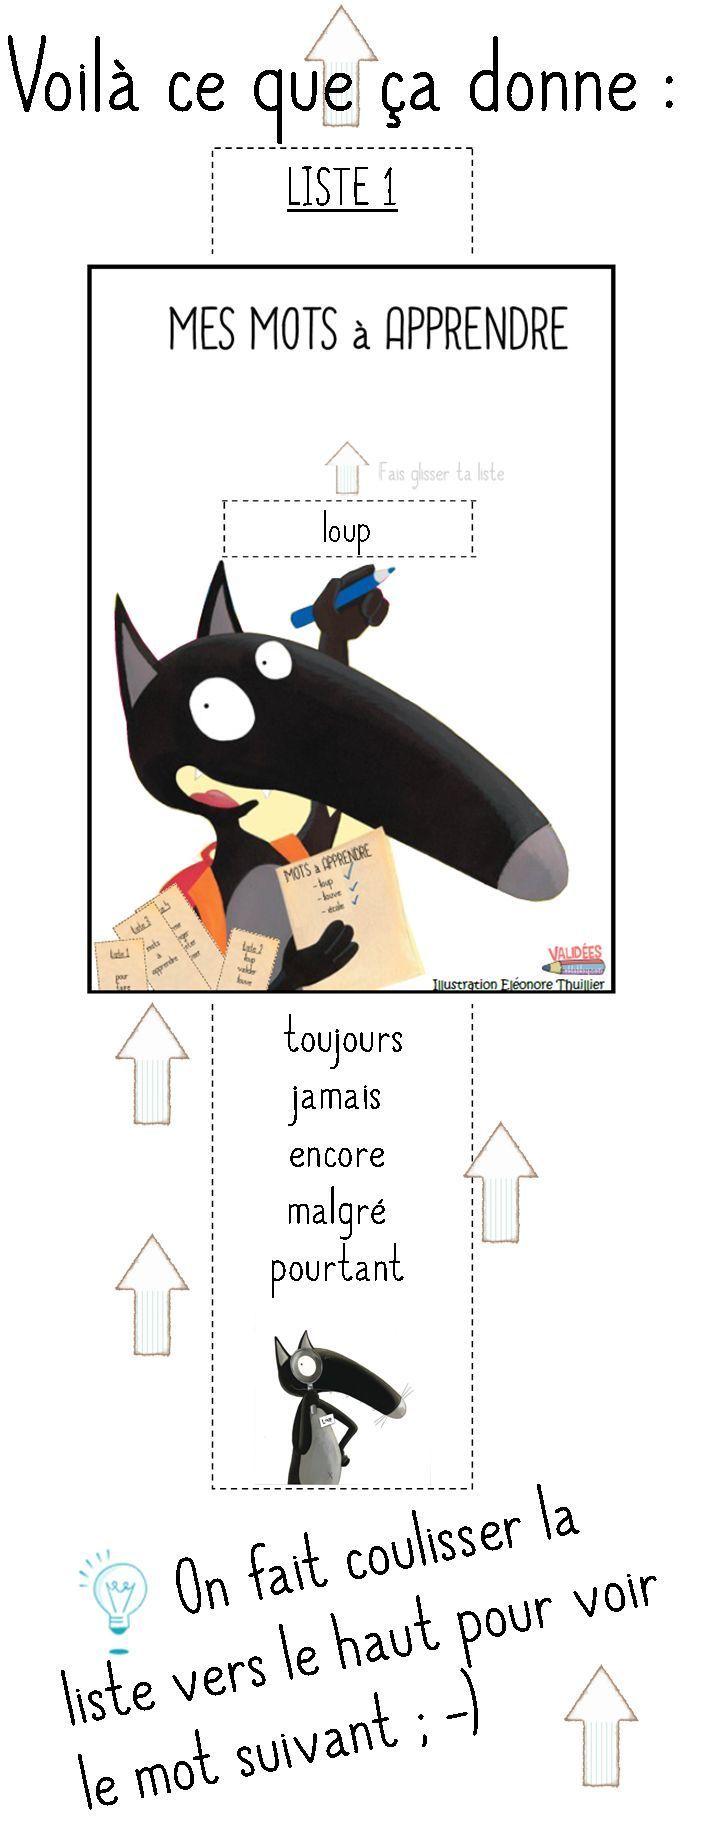 French reading practice. Mots à apprendre